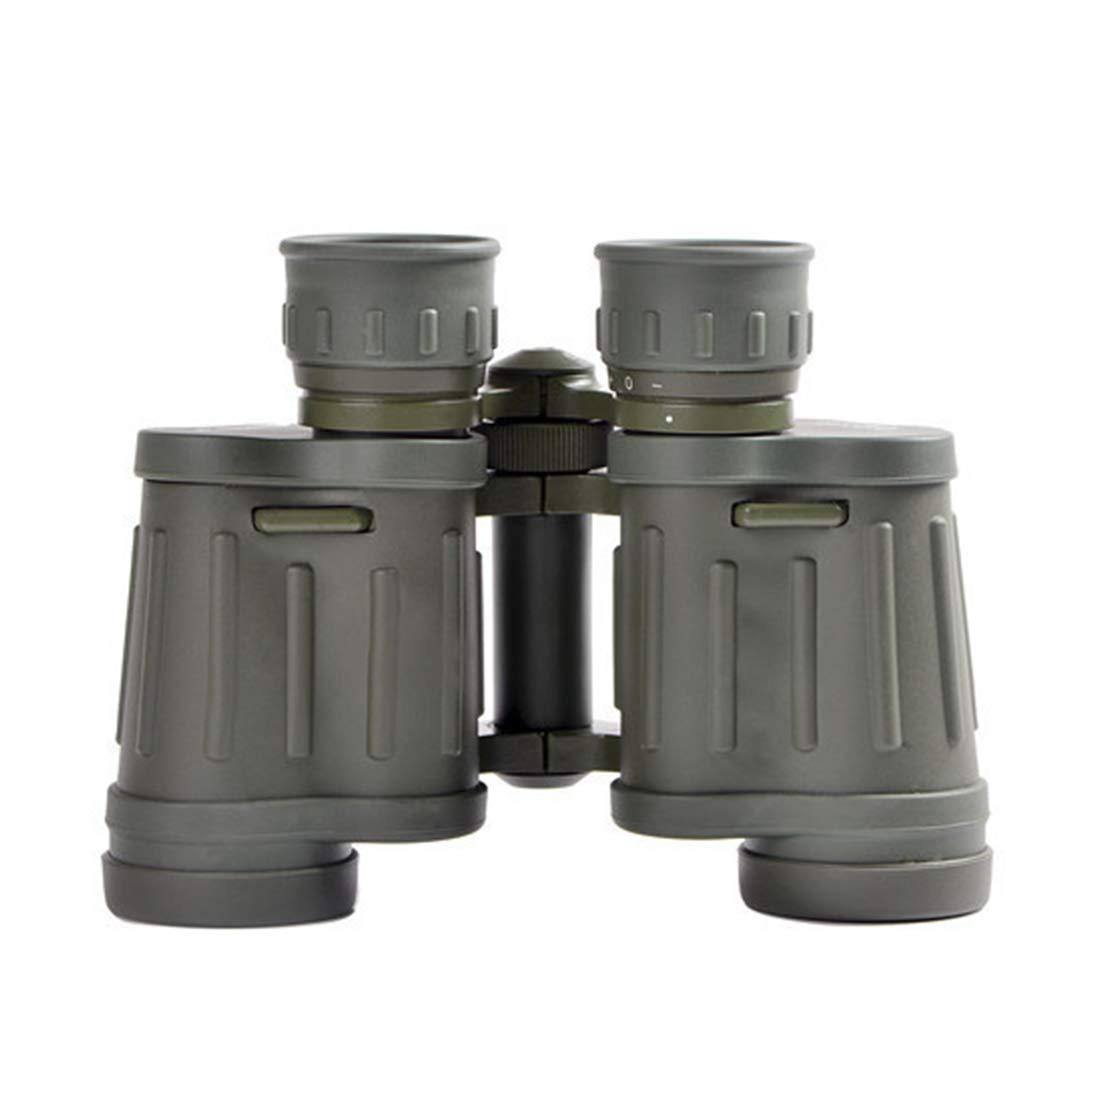 LNLW Binoculars for Climbing Hunting Sport Game, Professional Binoculars for Adults